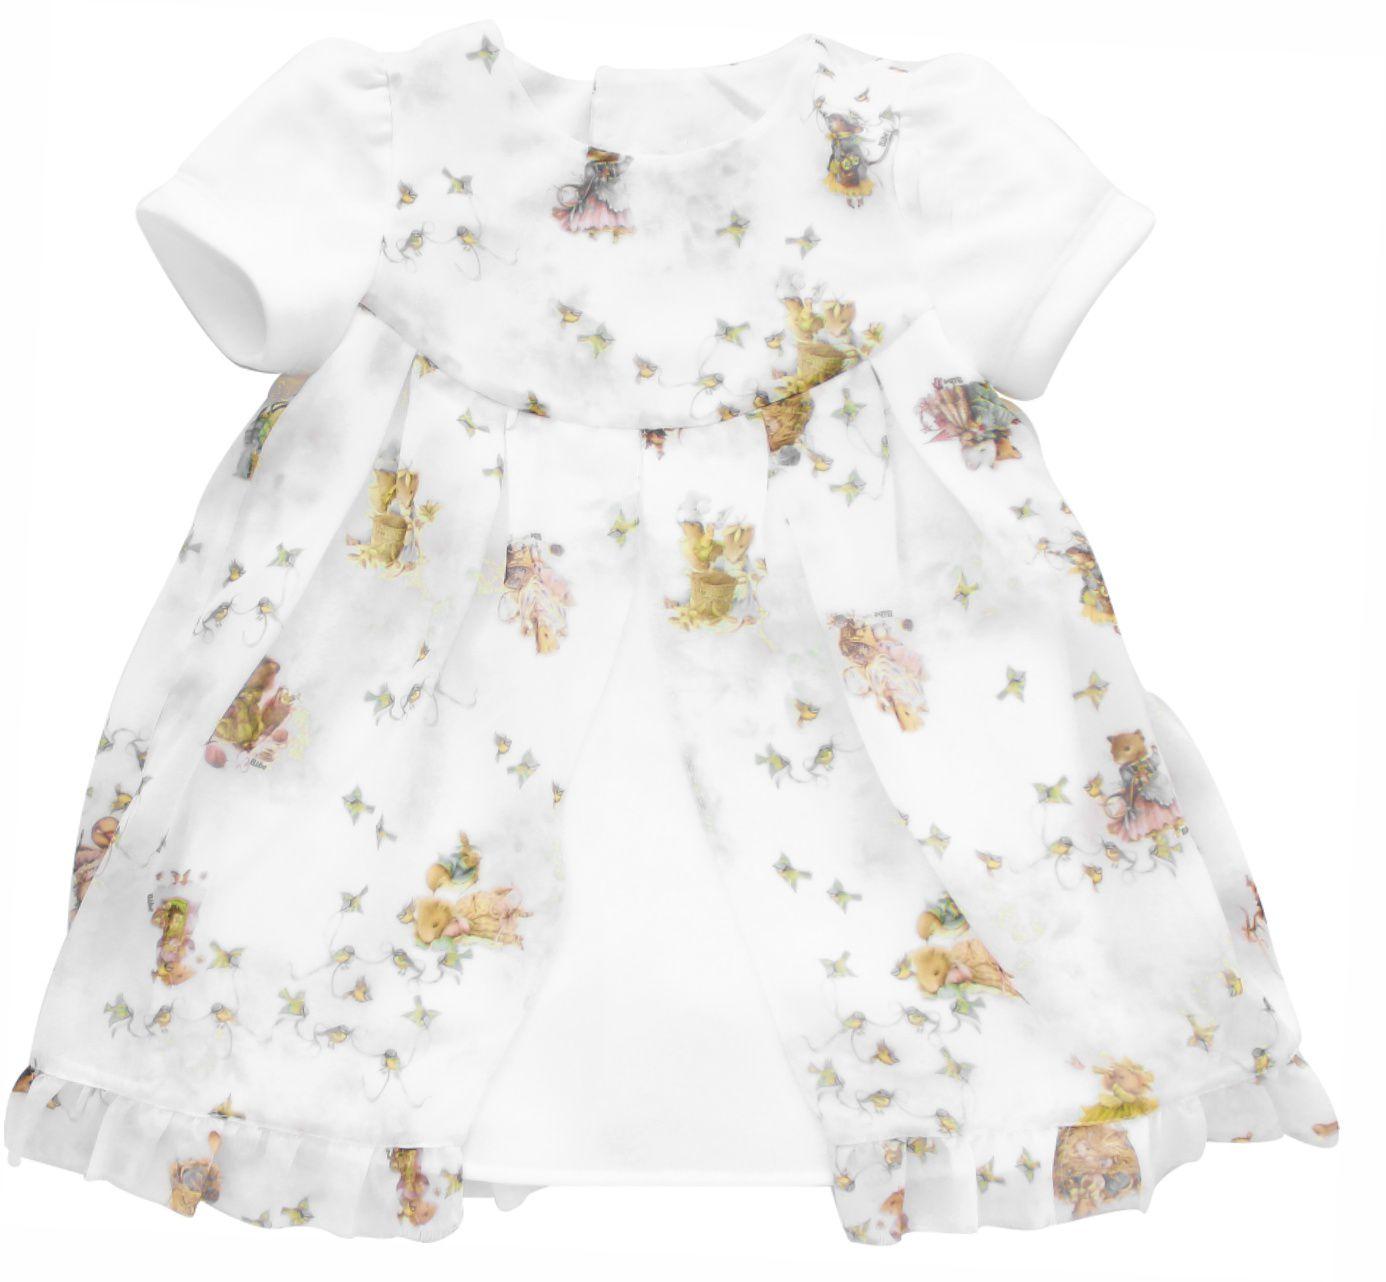 Vestido Feminino Manga Curta De Chiffon Estampa Ratinhos Infantil